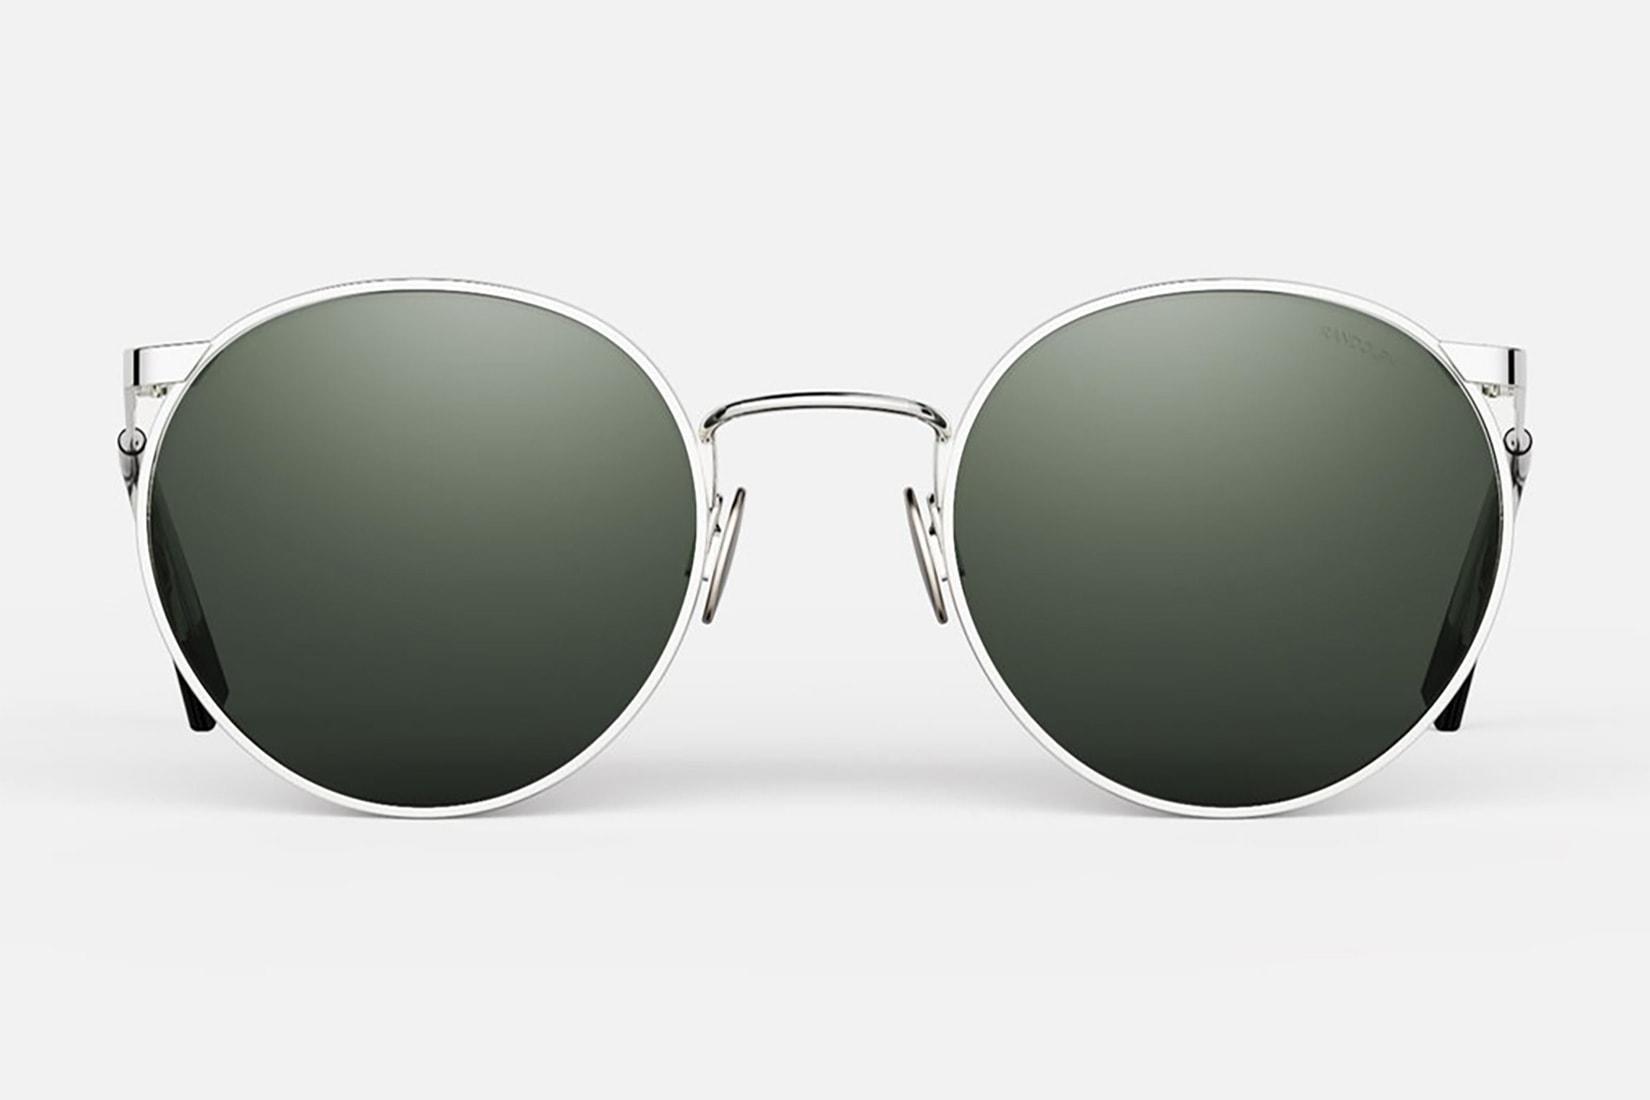 Randolph USA p3 women sunglasses review - Luxe Digital